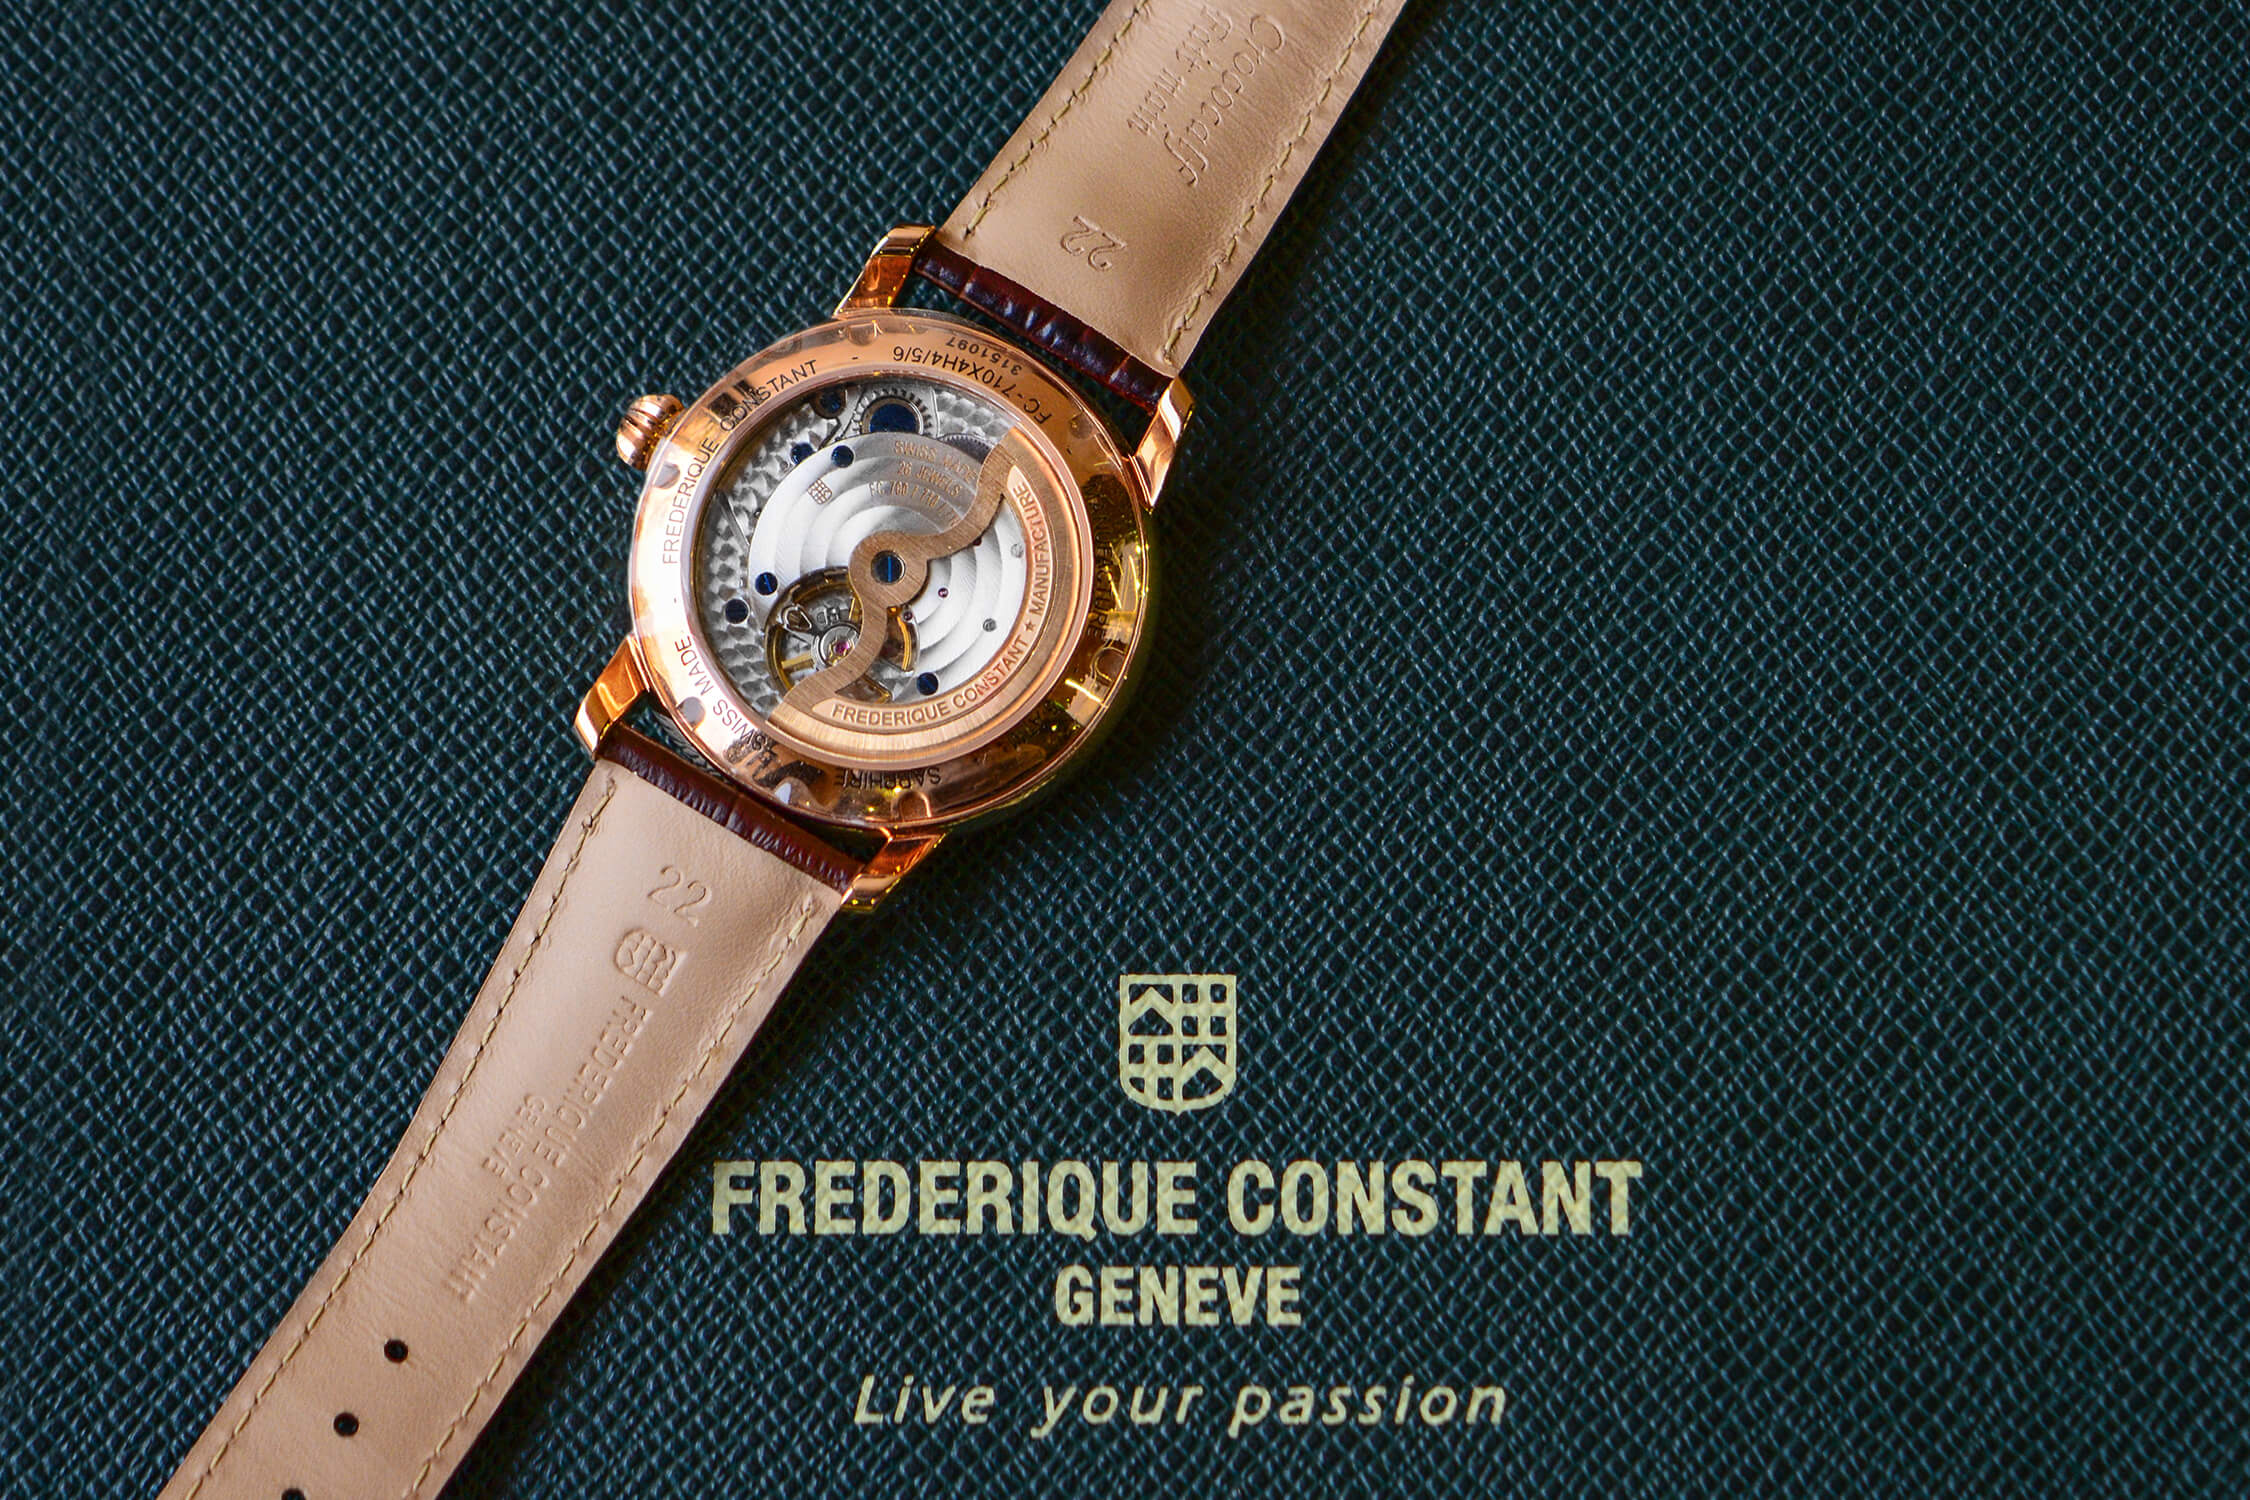 часы фредерик констант